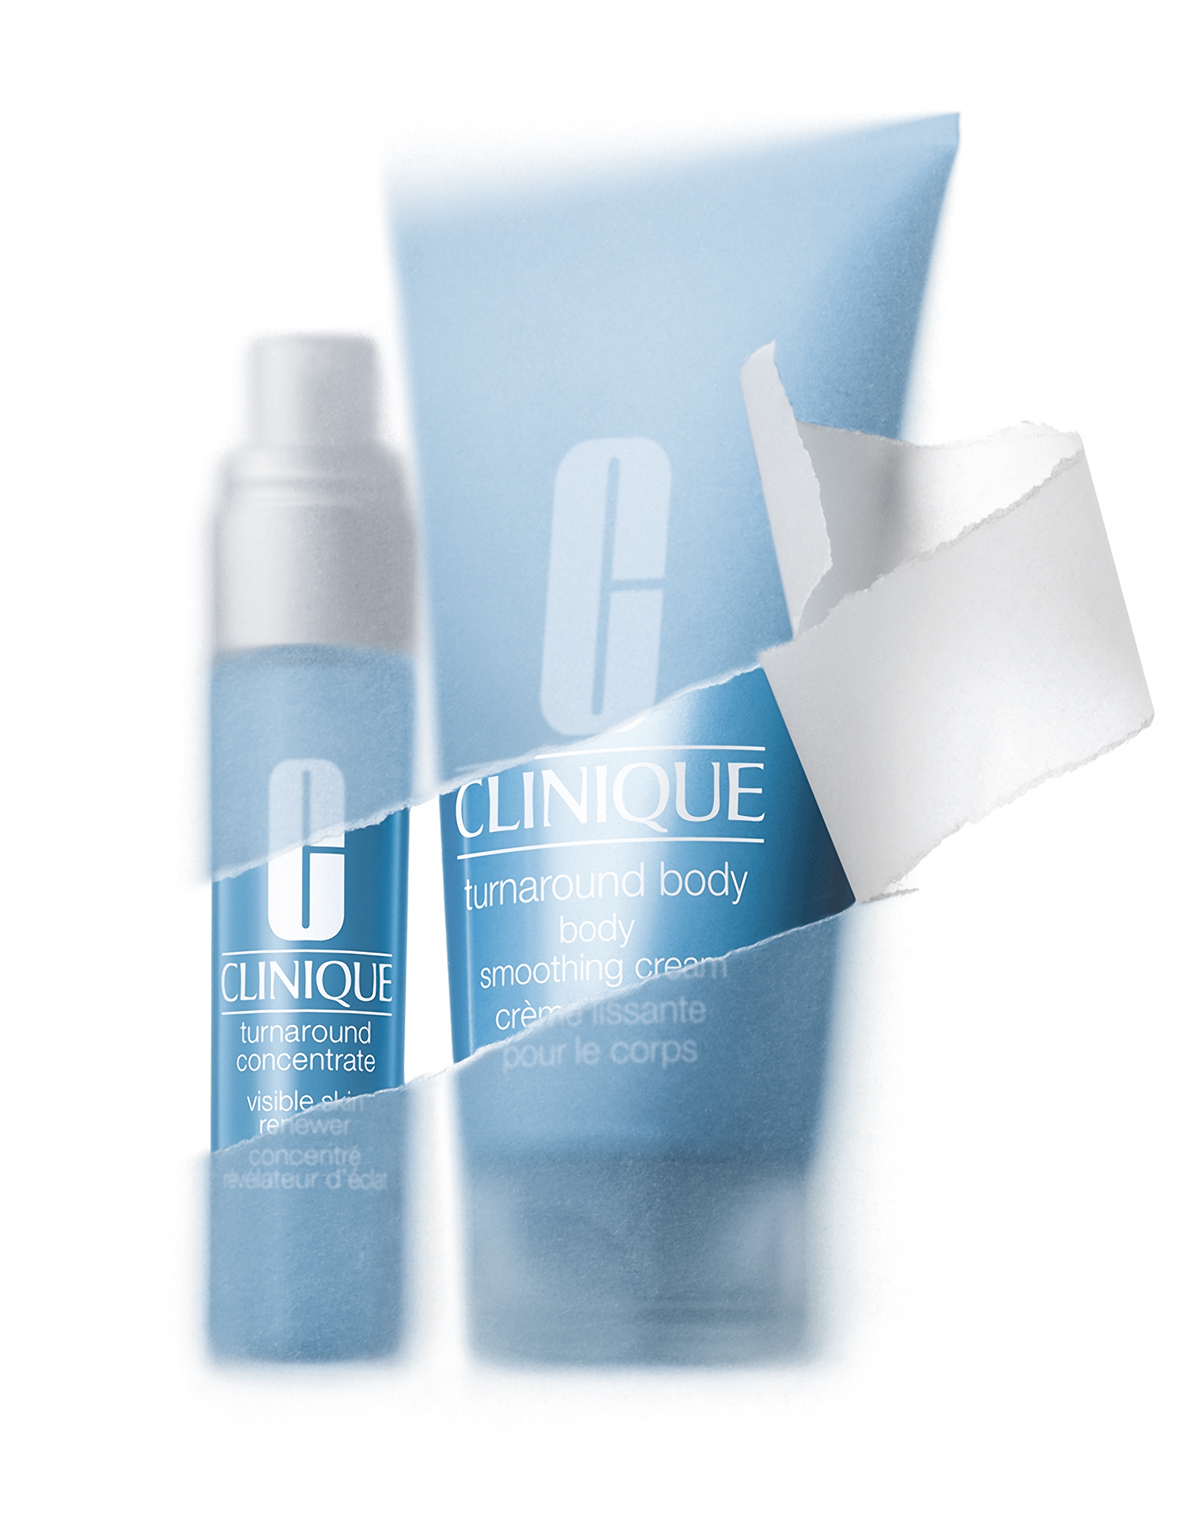 rp-clinique-advertising-034.jpg